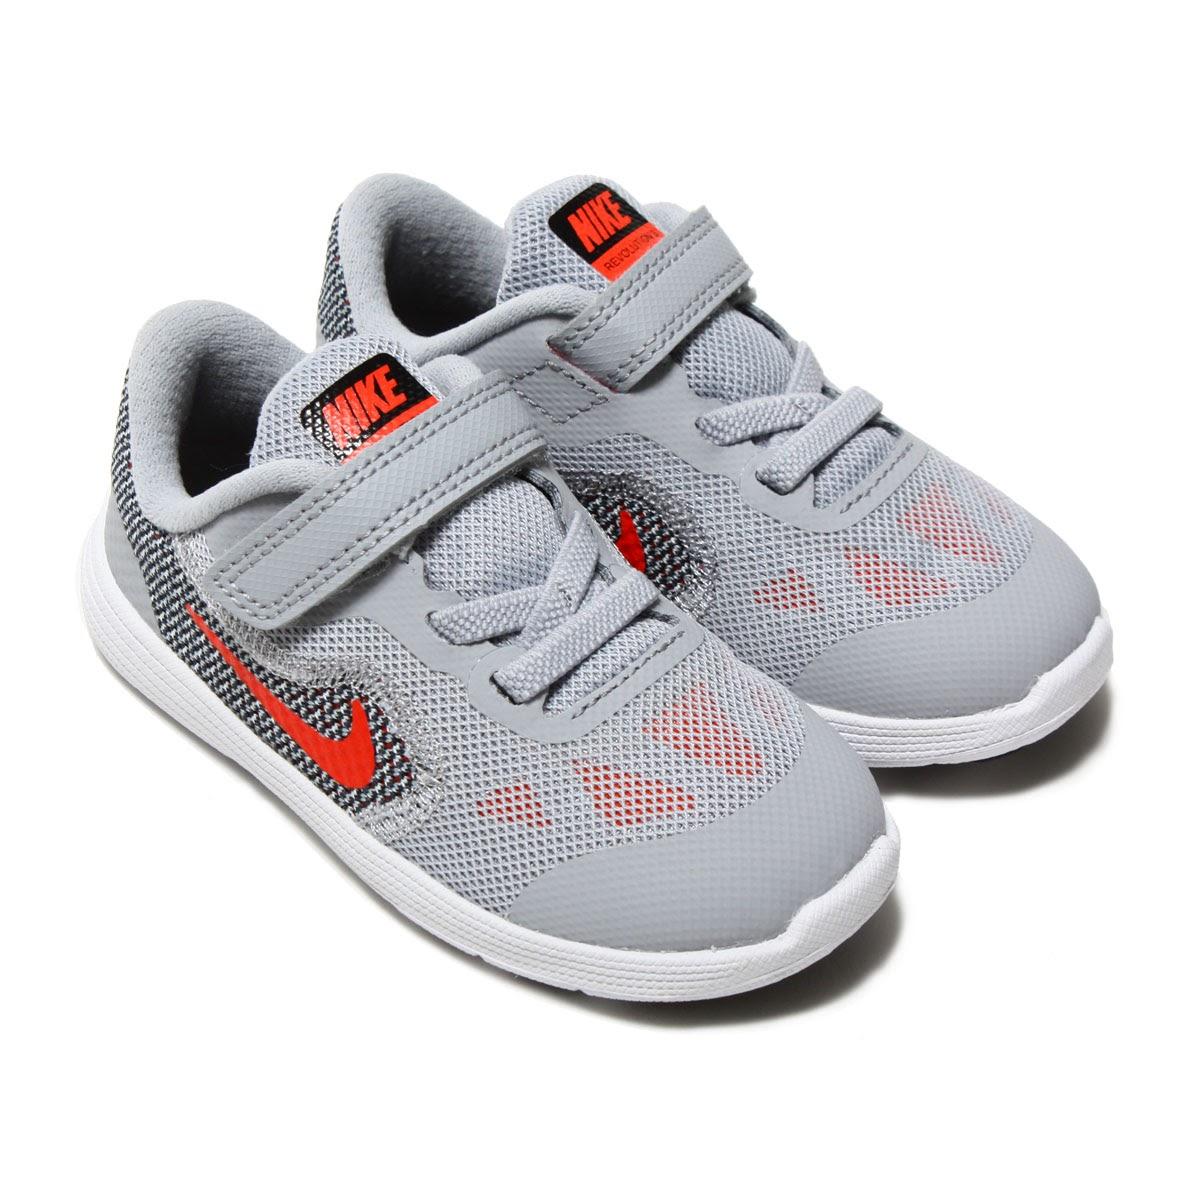 bb7c3c3233d8 NIKE REVOLUTION 3 (TDV) (Nike revolution 3 TDV) WOLF GREY MAX ORANGE-BLACK- WHITE 18SP-I